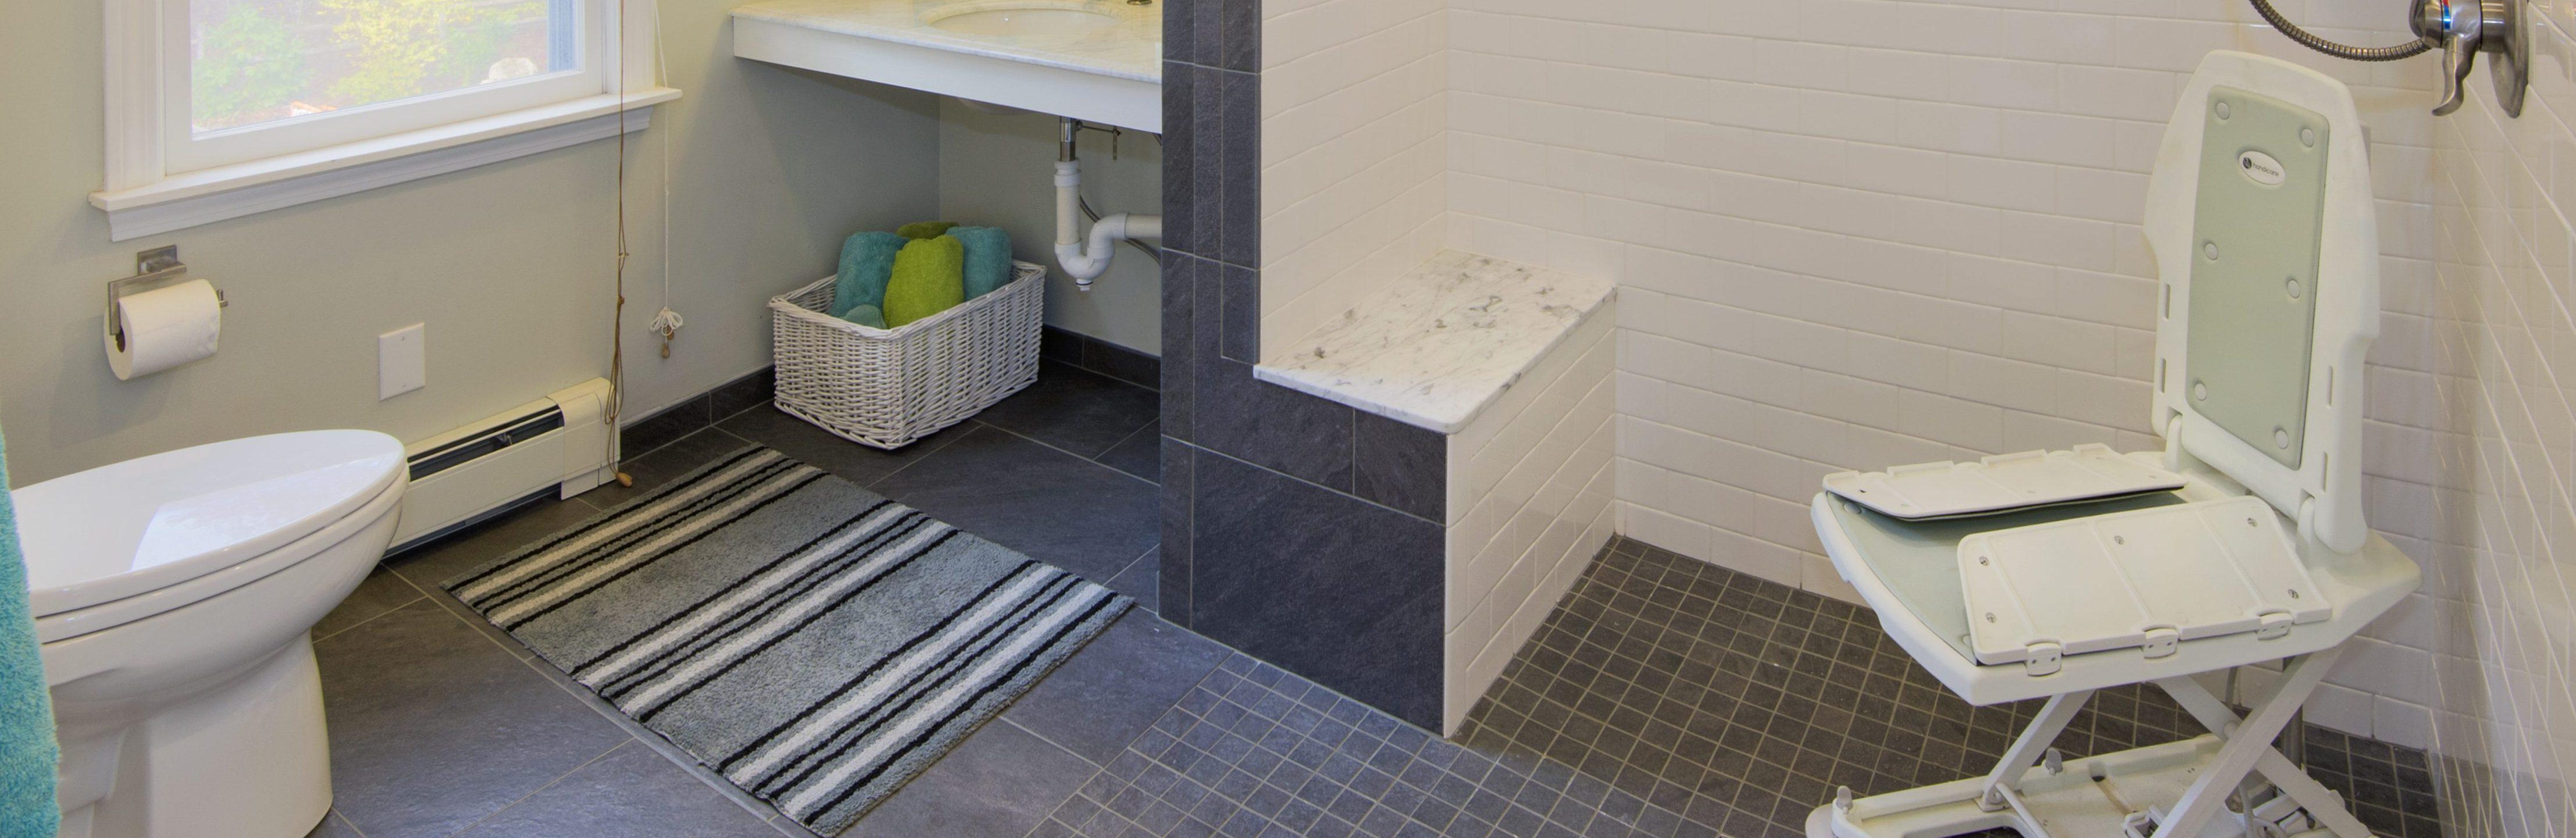 Home modification loan program cedac for Bath remodel financing